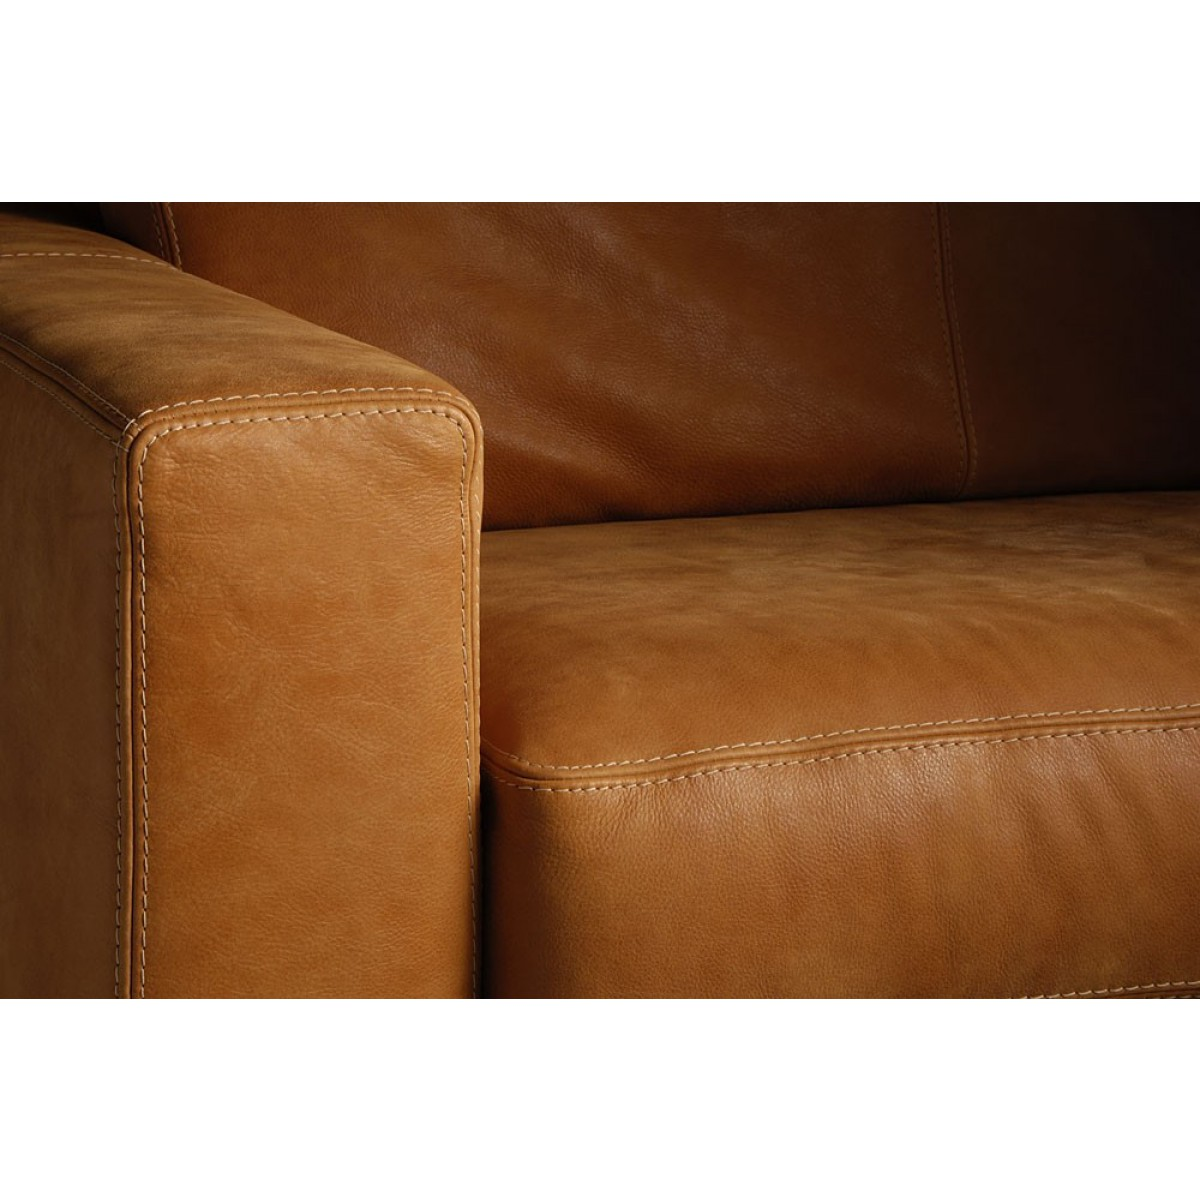 eldorado-bank-sofa-het-anker-africa-leder-detail